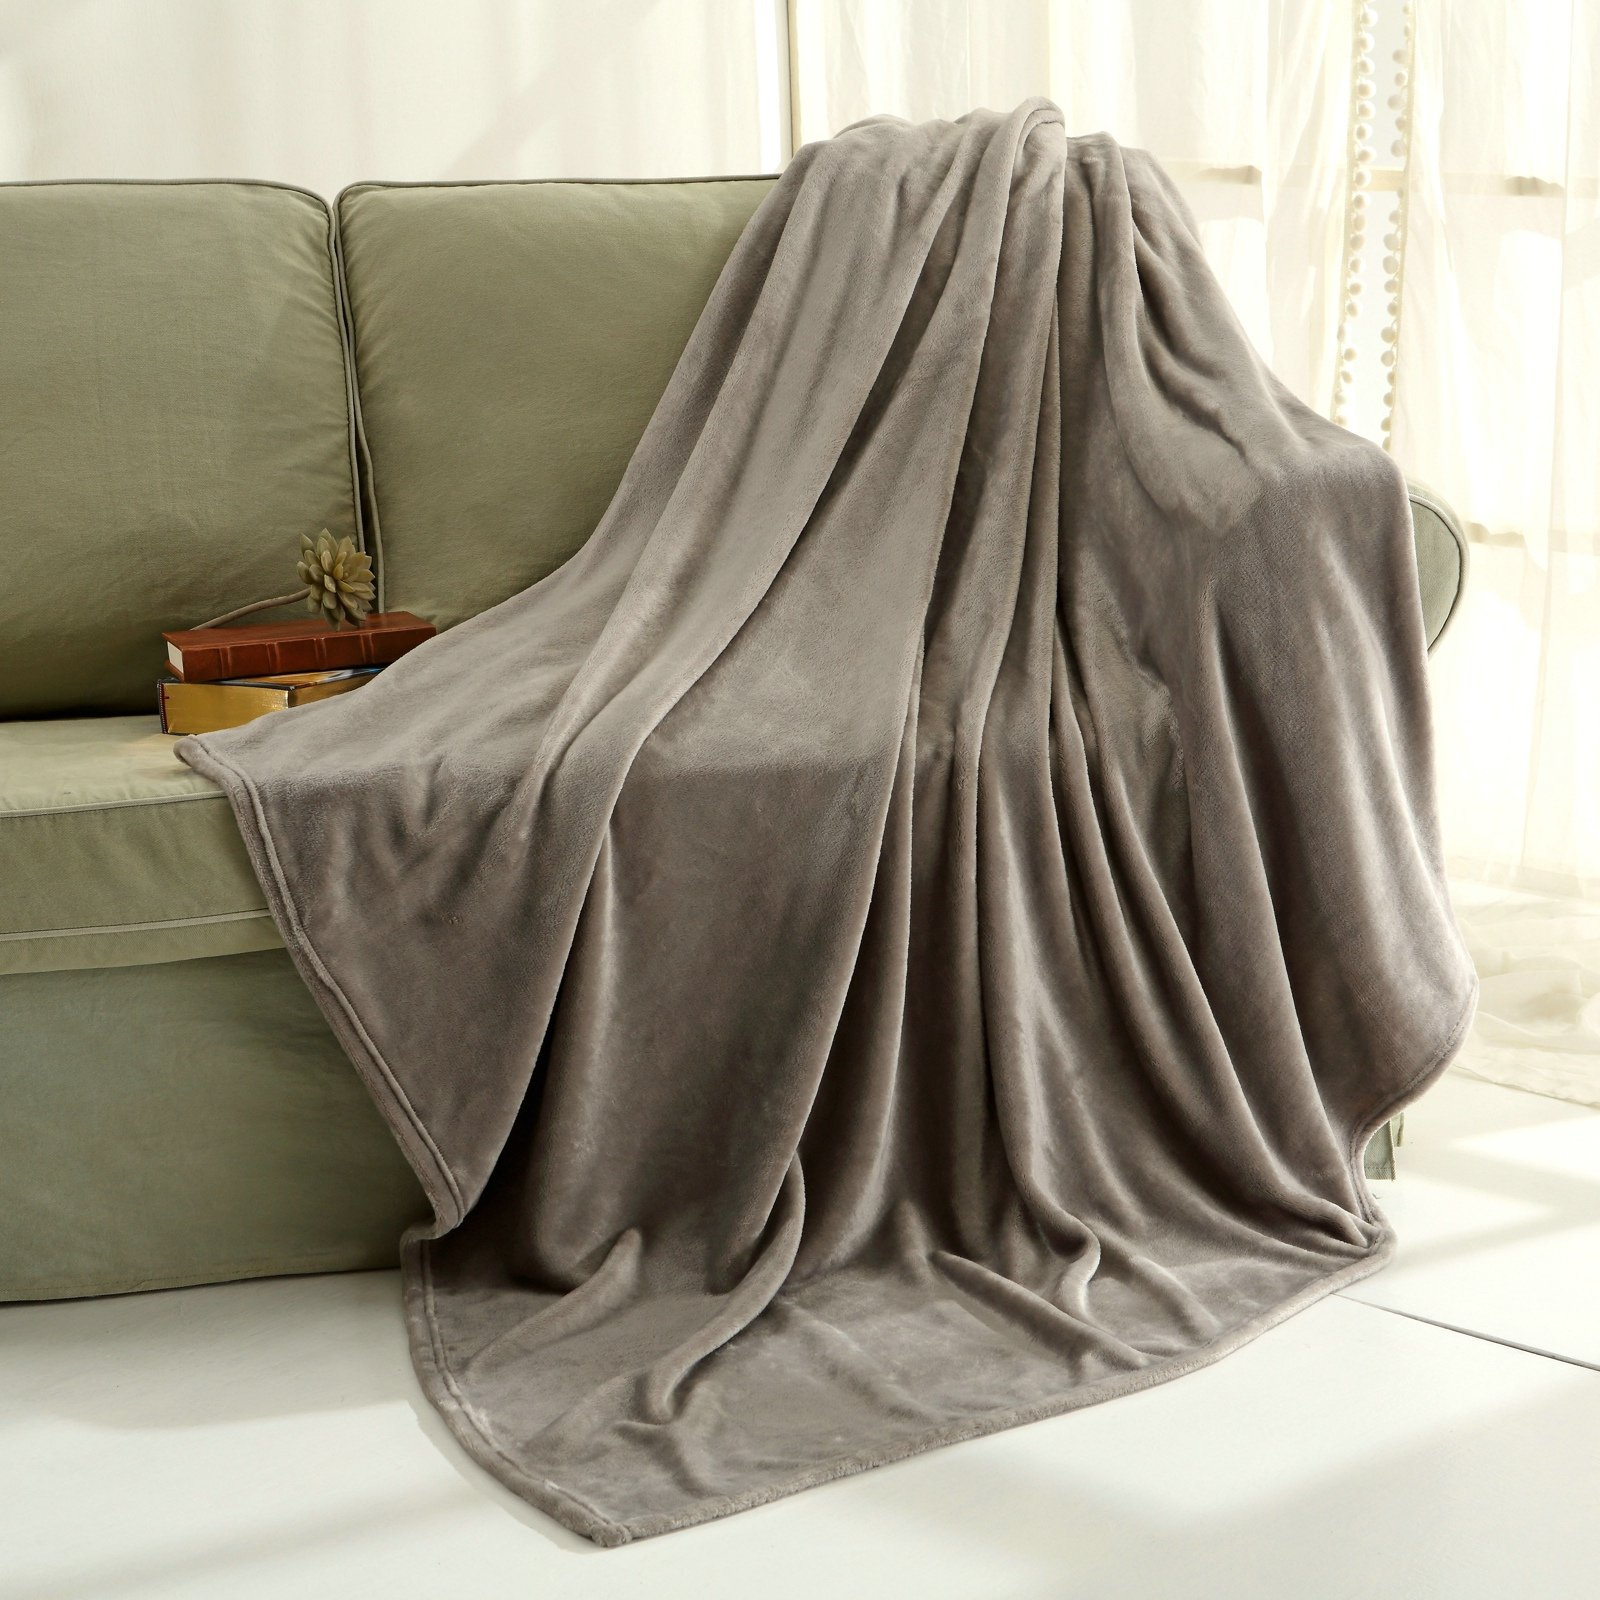 Get Quotations · Flannel Throw Blanket Luxury Grey Size 50x60 Inches  Lightweight Plush Microfiber Fleece All Season Super Soft c82661fd8